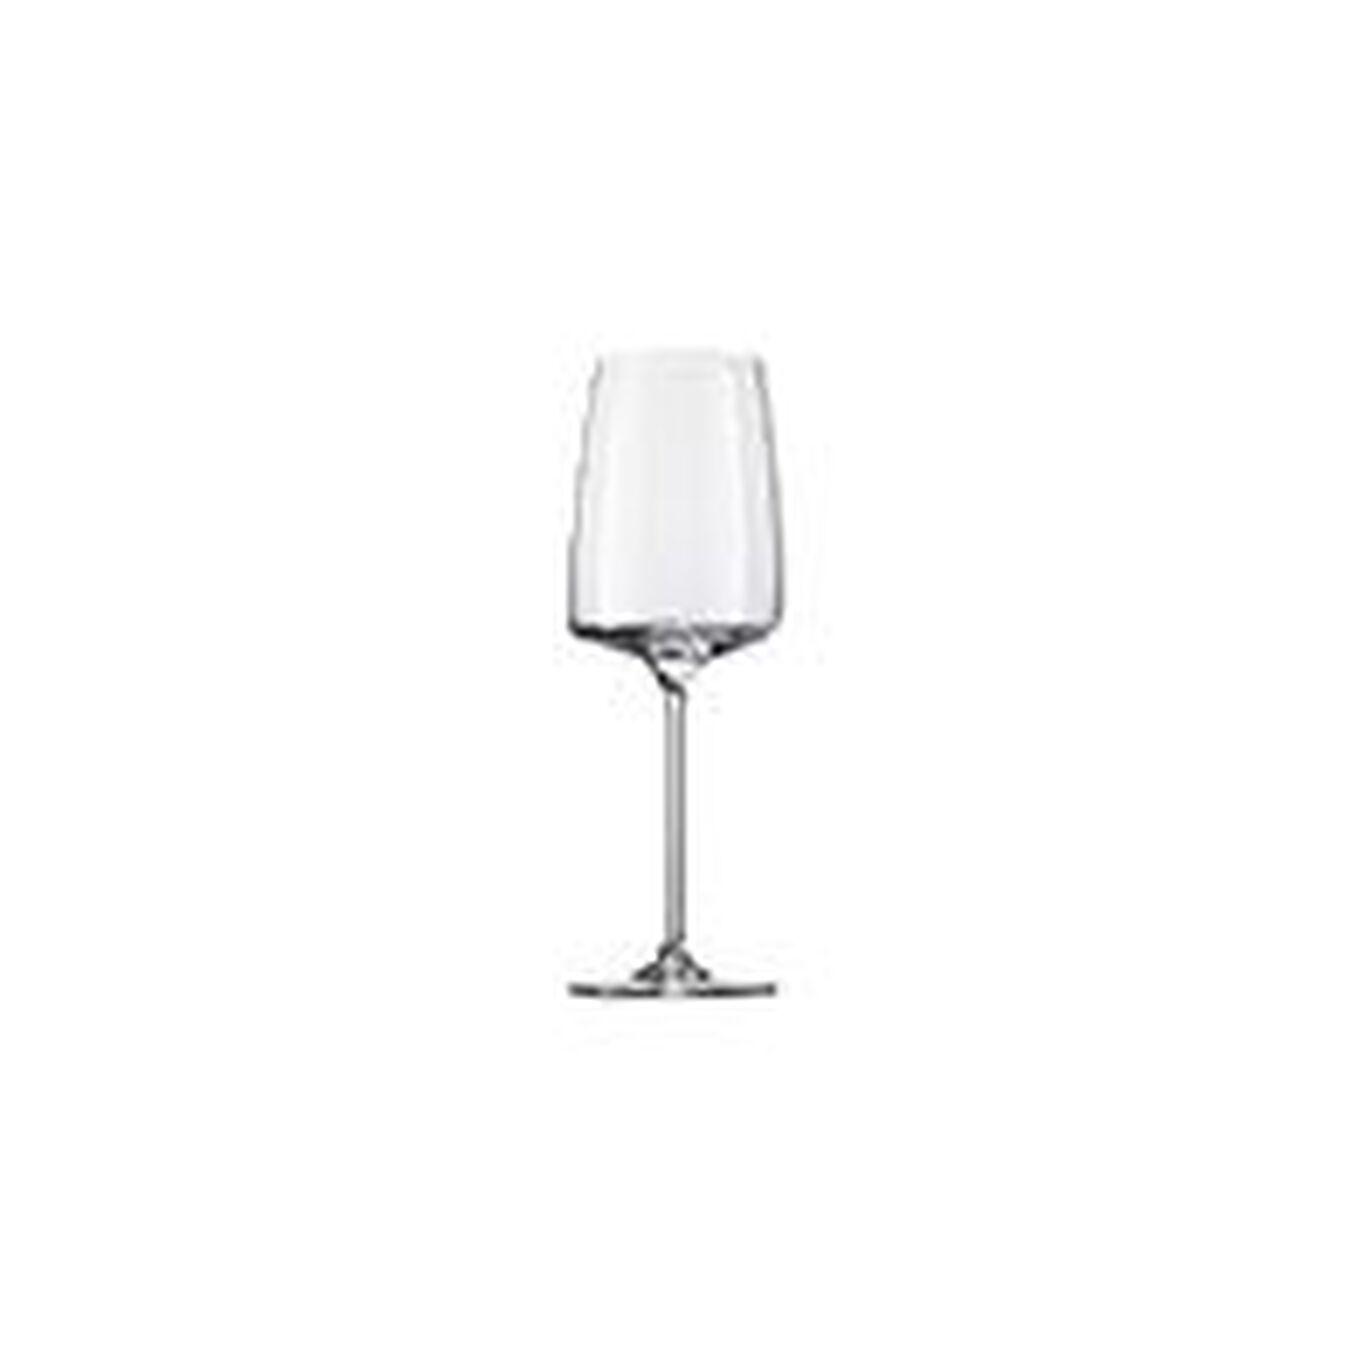 Taça para vinho branco 400 ml,,large 1